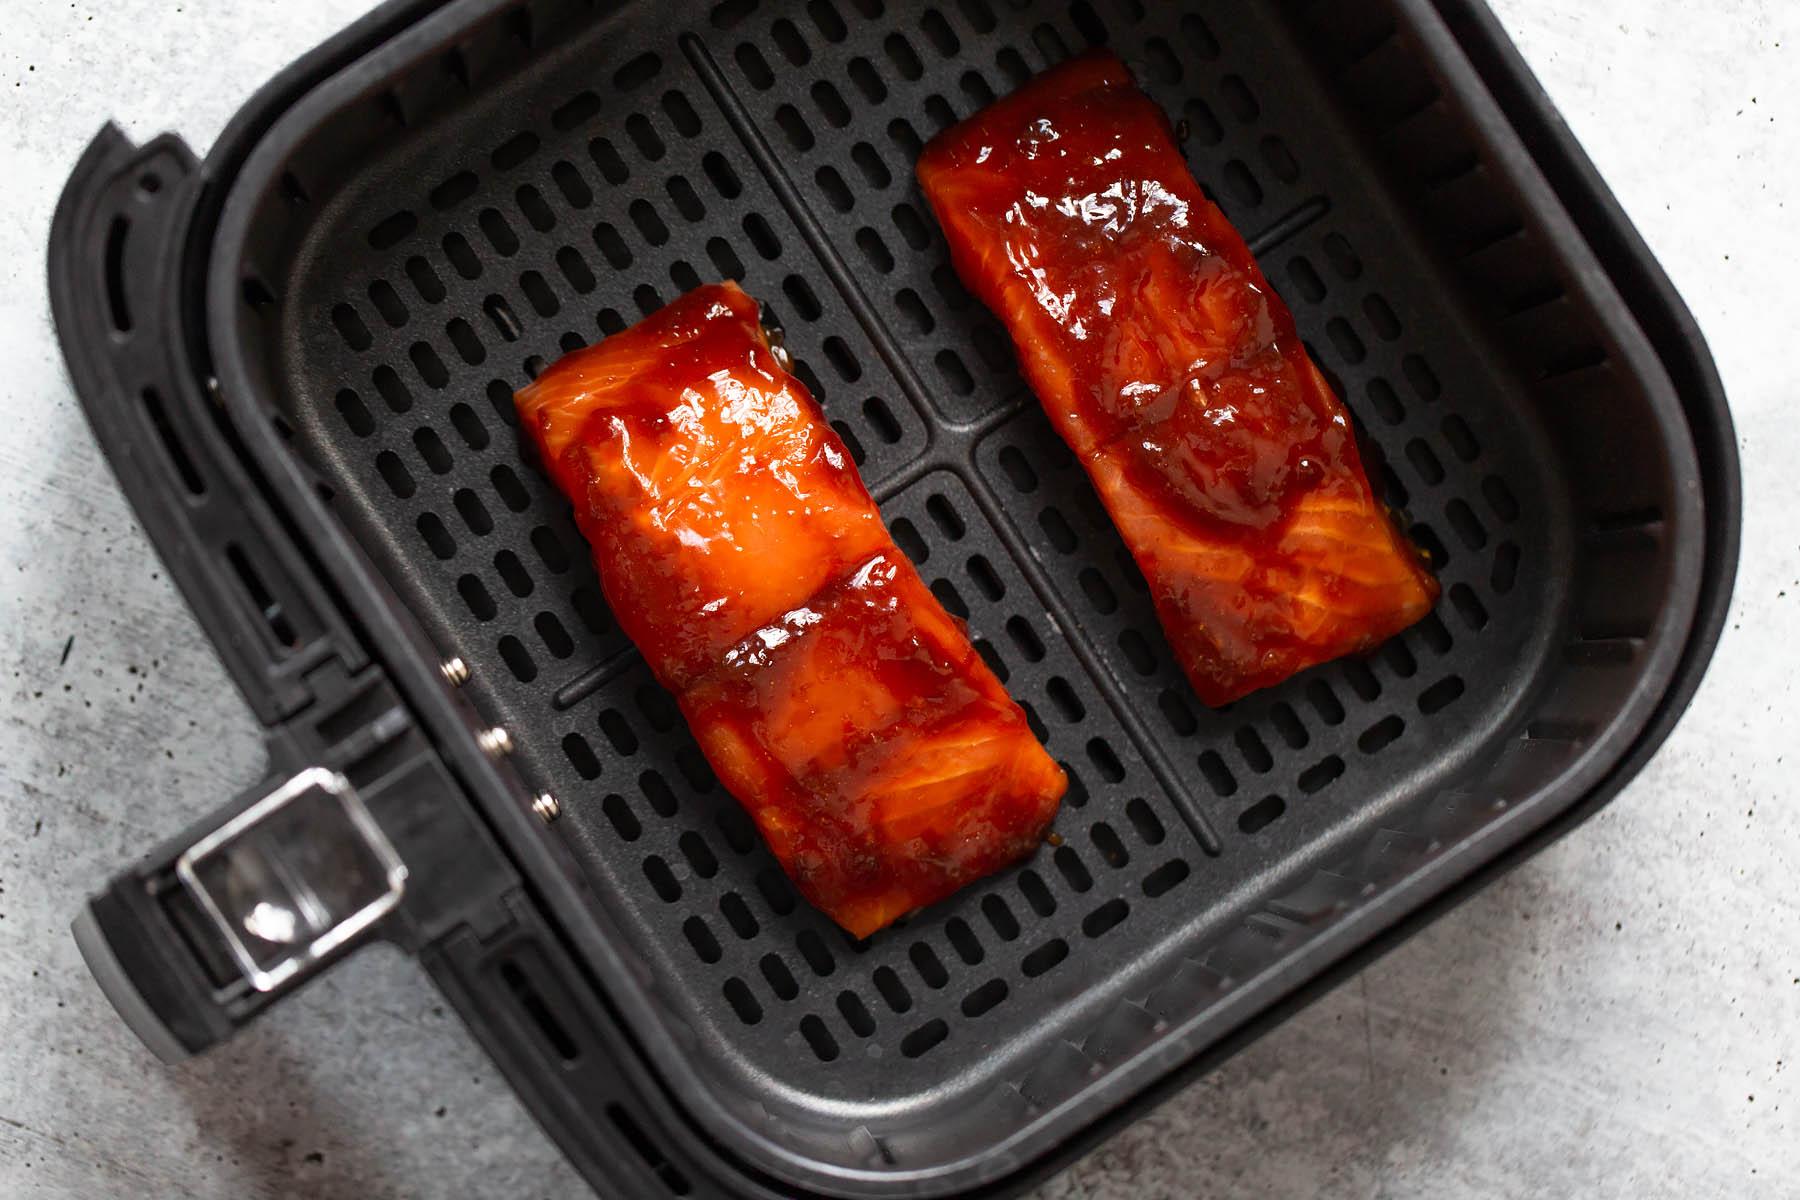 teriyaki salmon in the air fryer basket